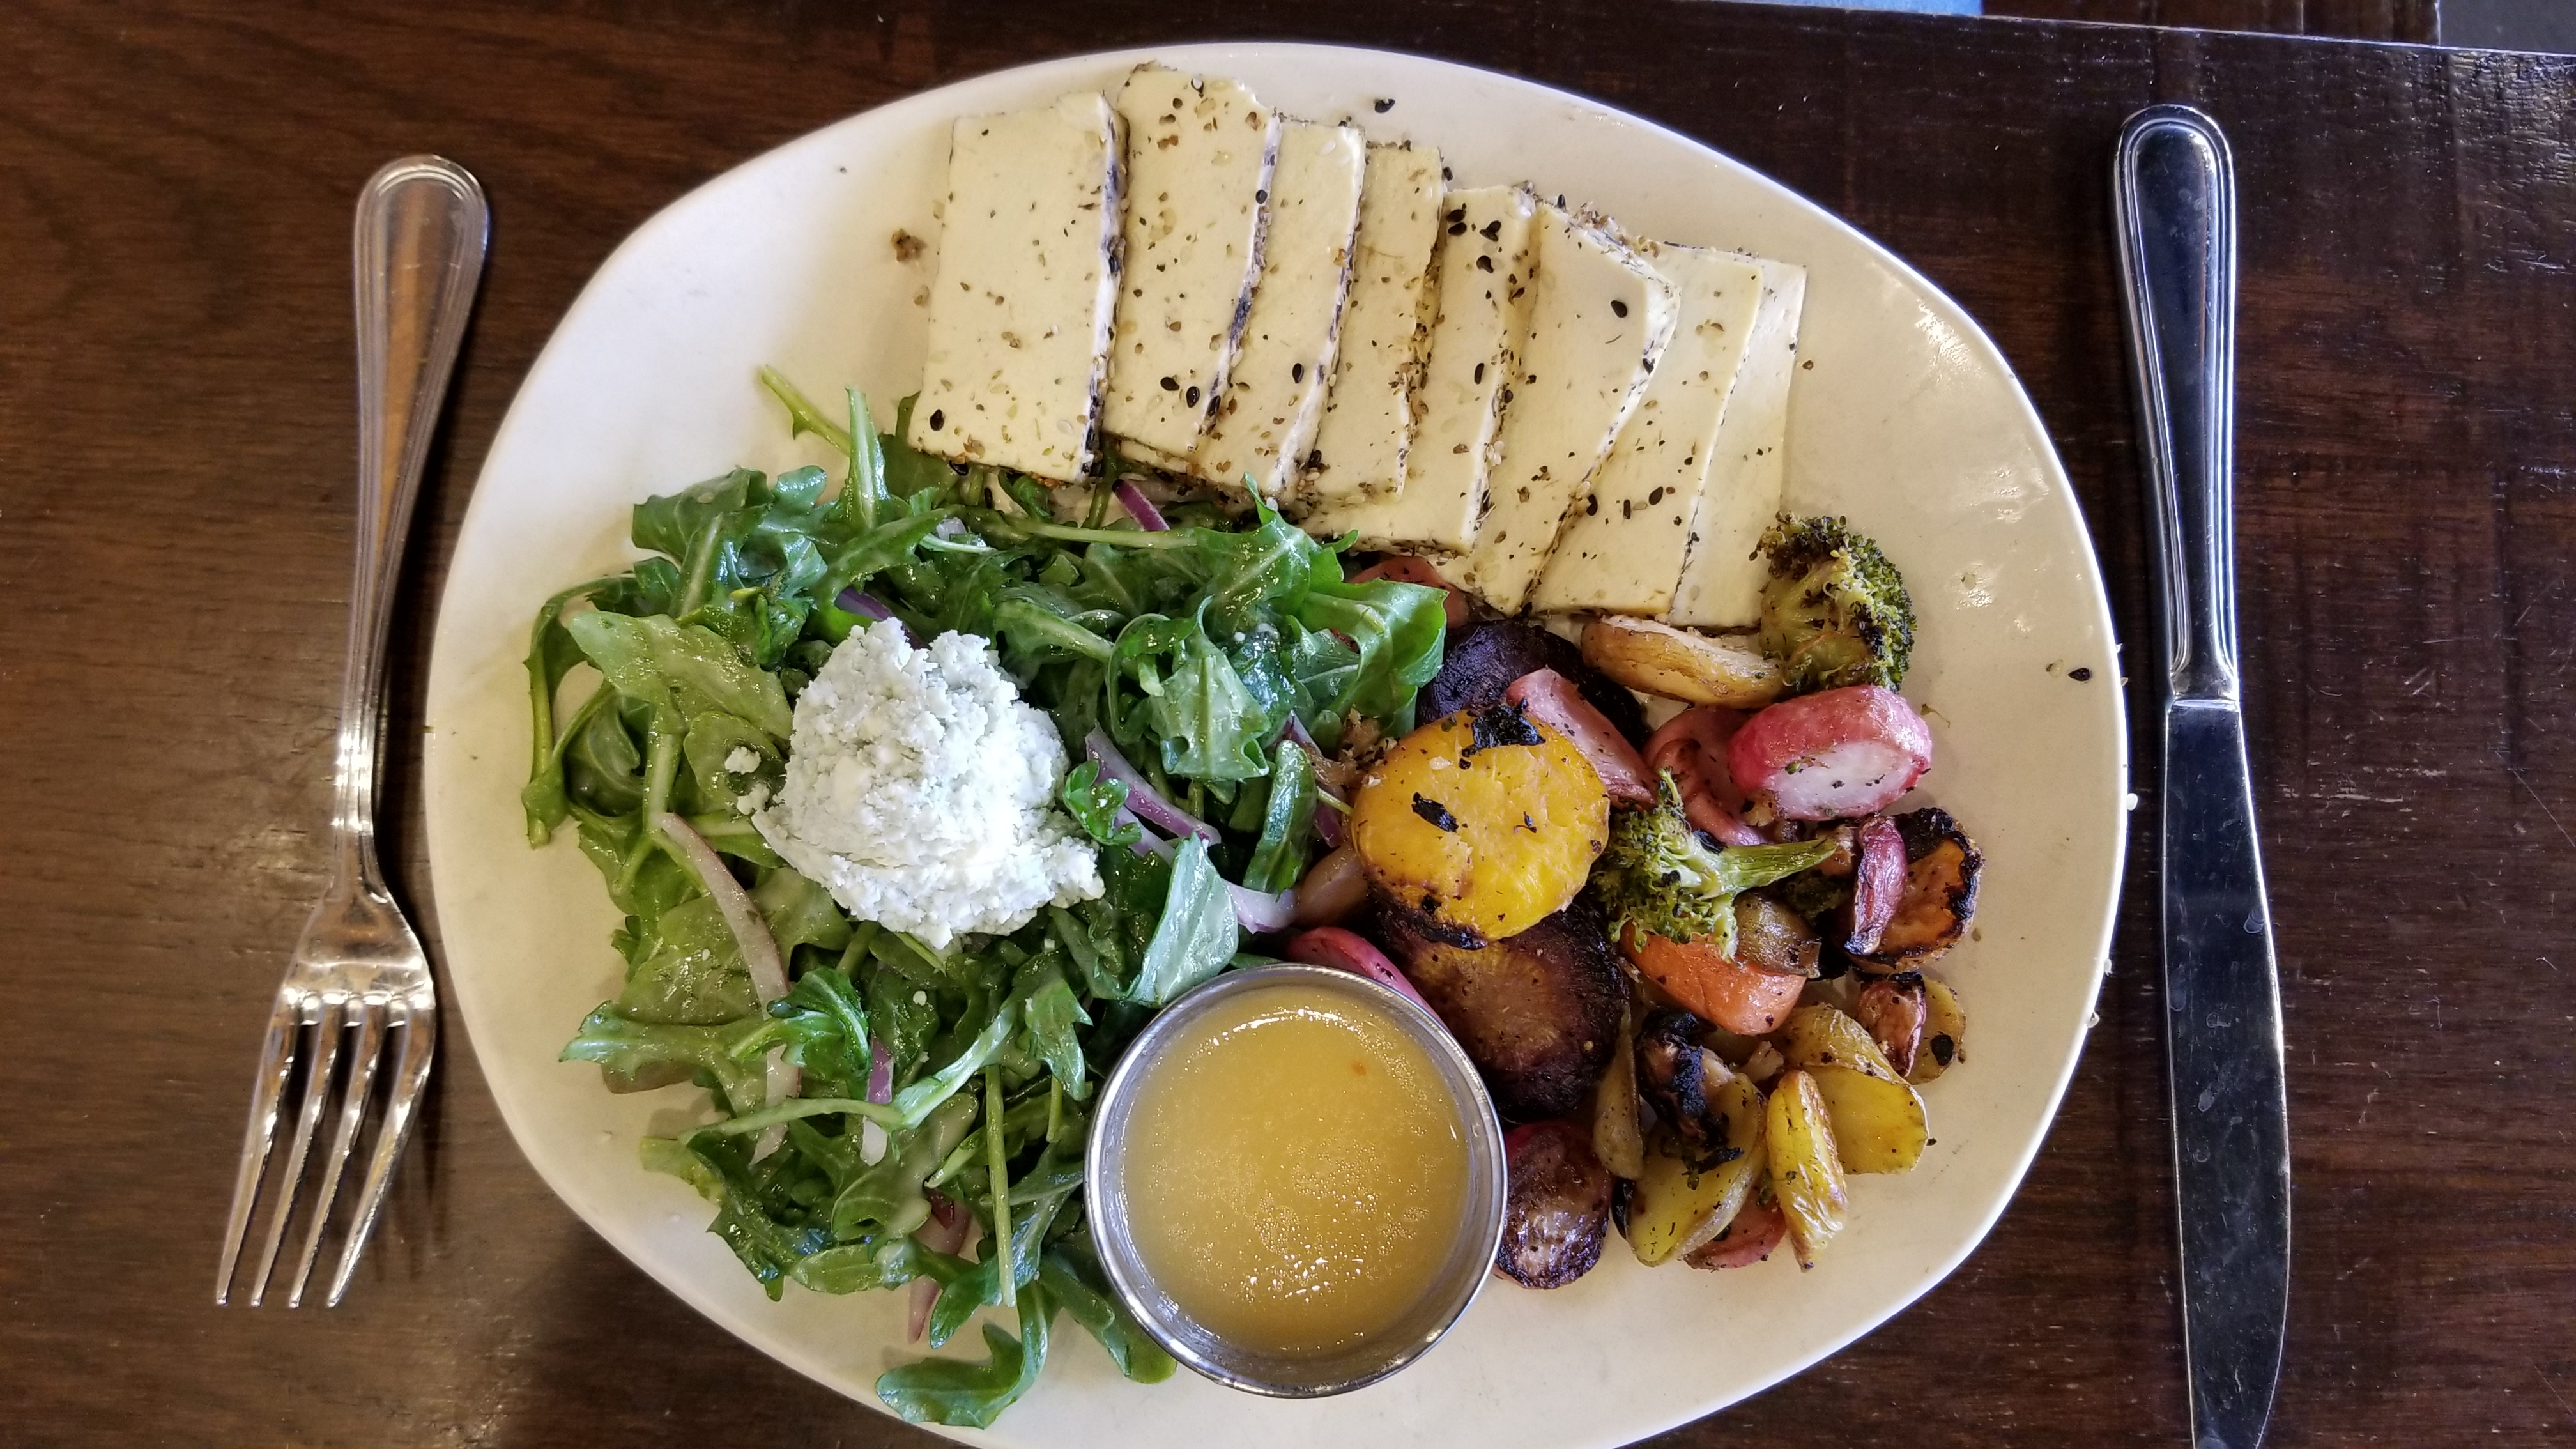 Tofu salad, fresh and delicious!